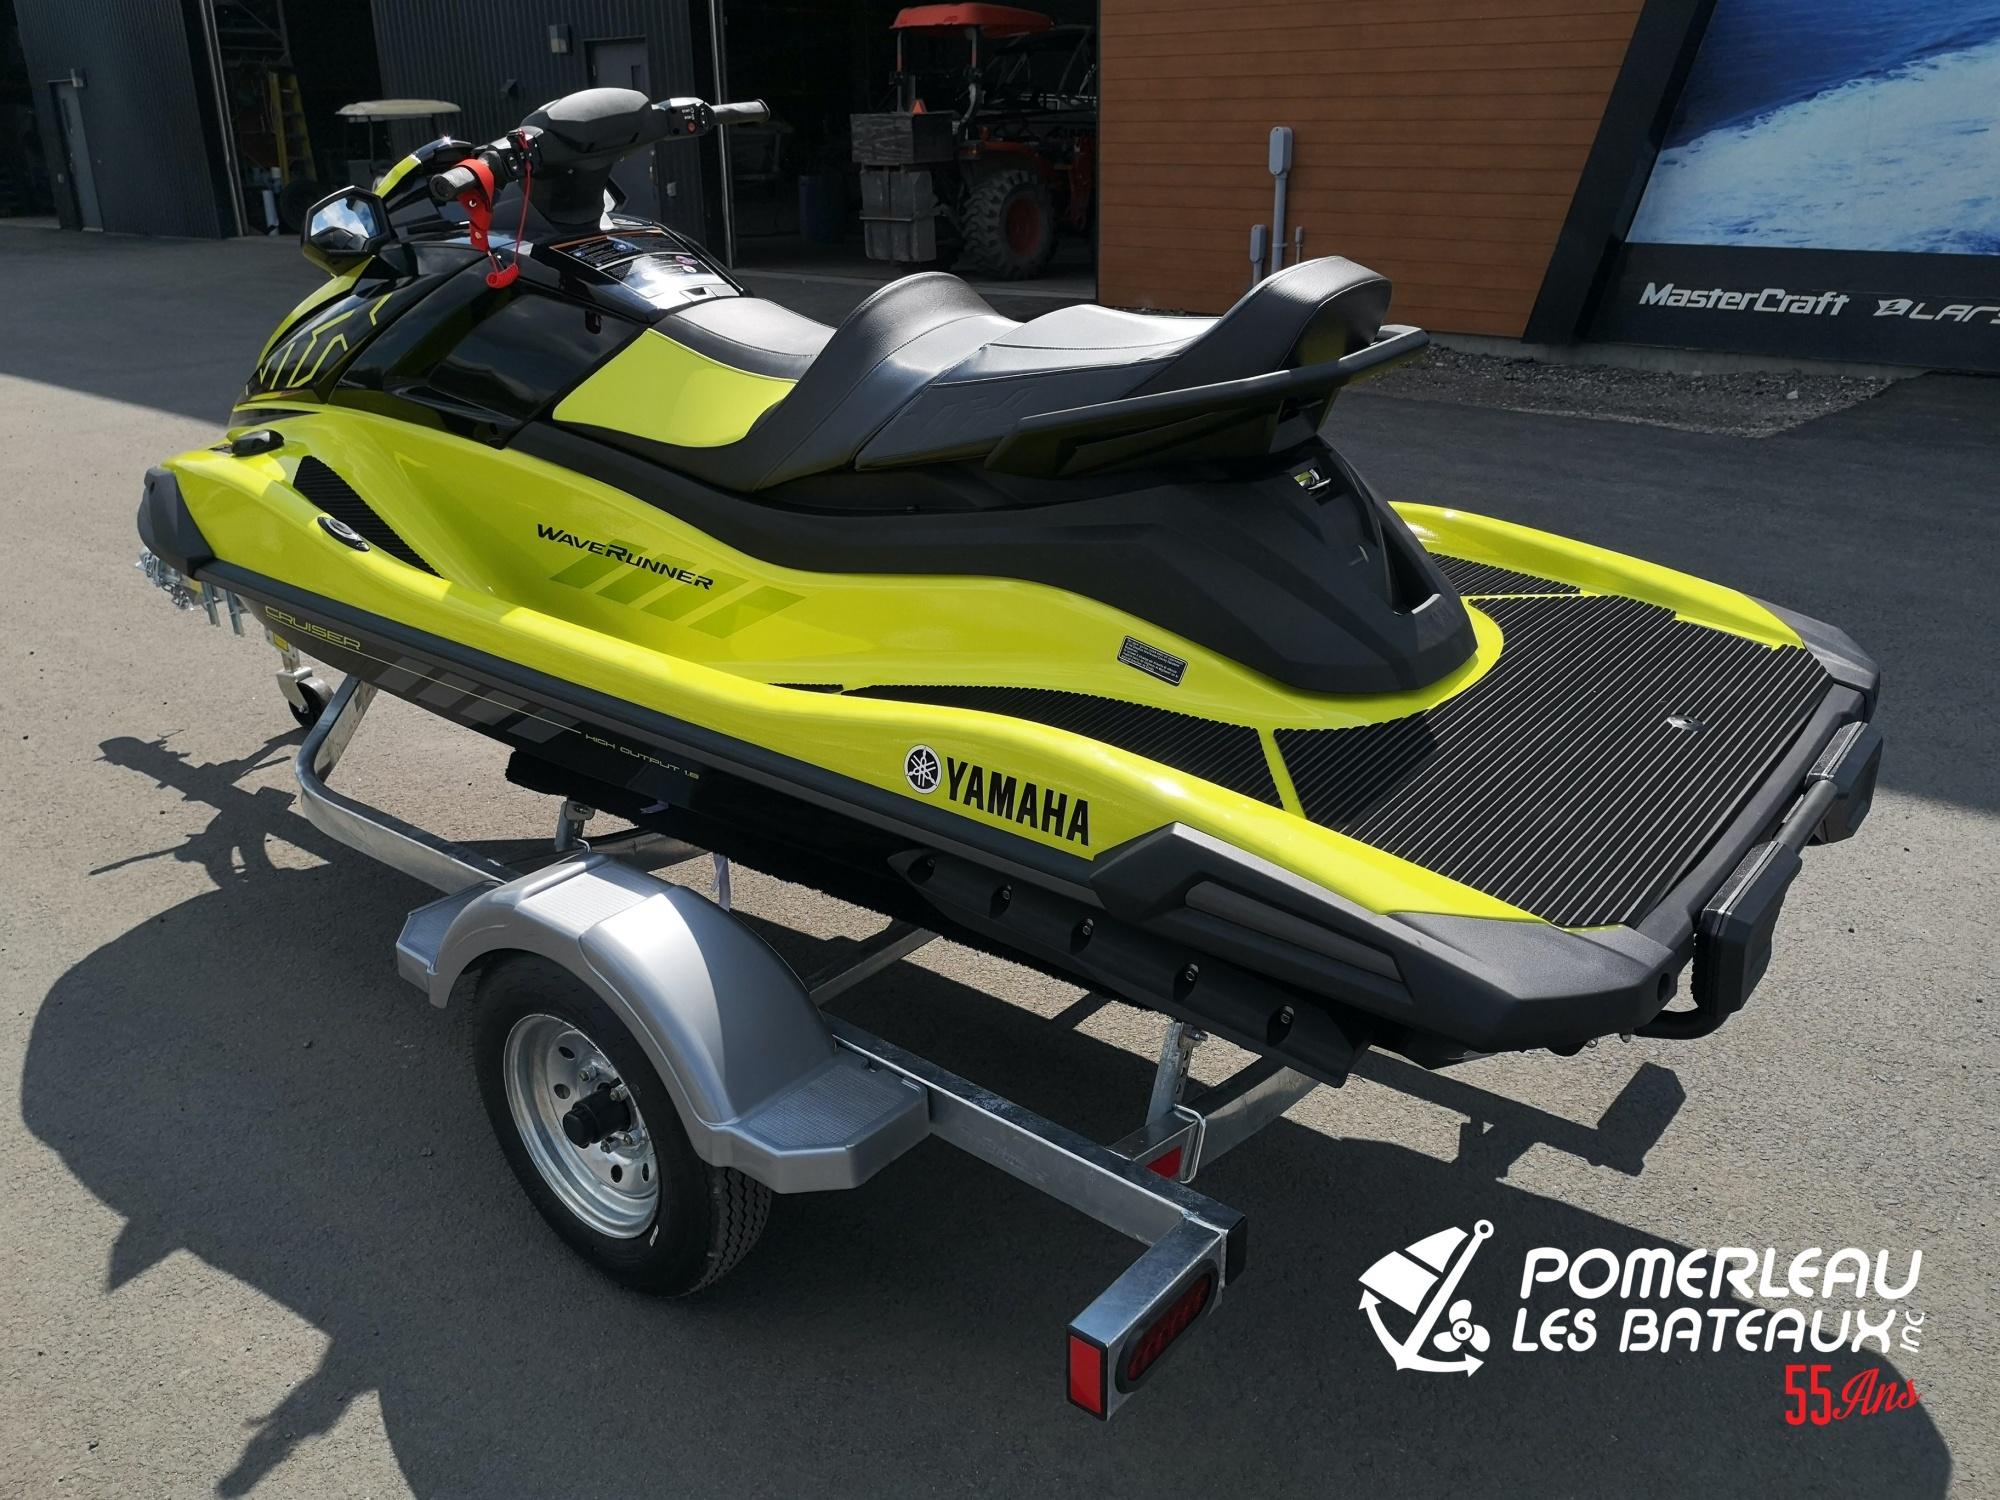 Yamaha vx cruiser ho - IMG_20210824_131423